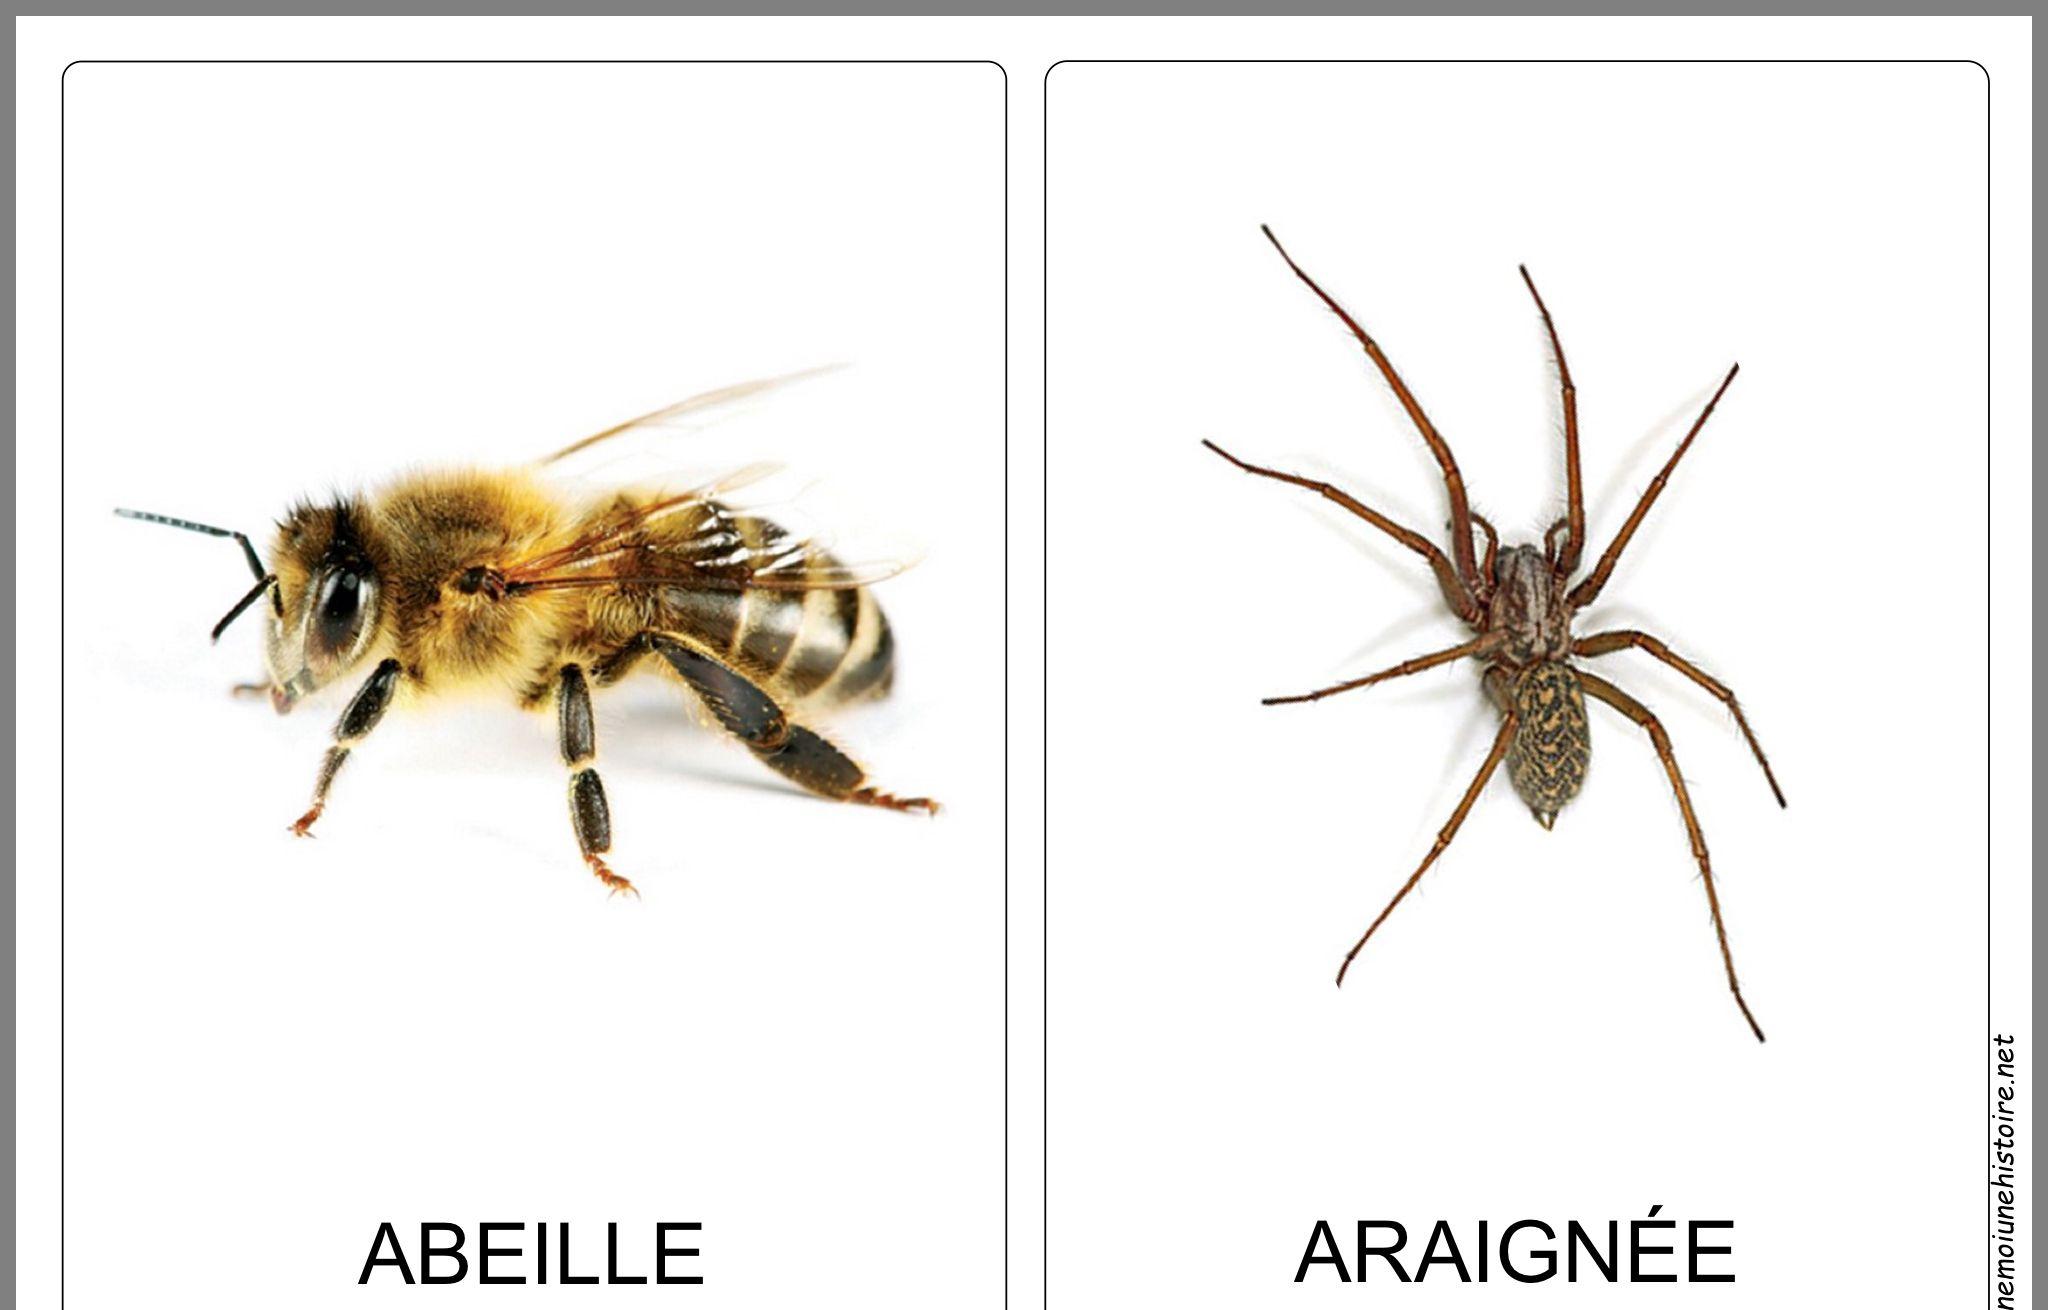 Pin Von Idalina Monbaron Auf Petites Bêtes concernant Imagier Insectes